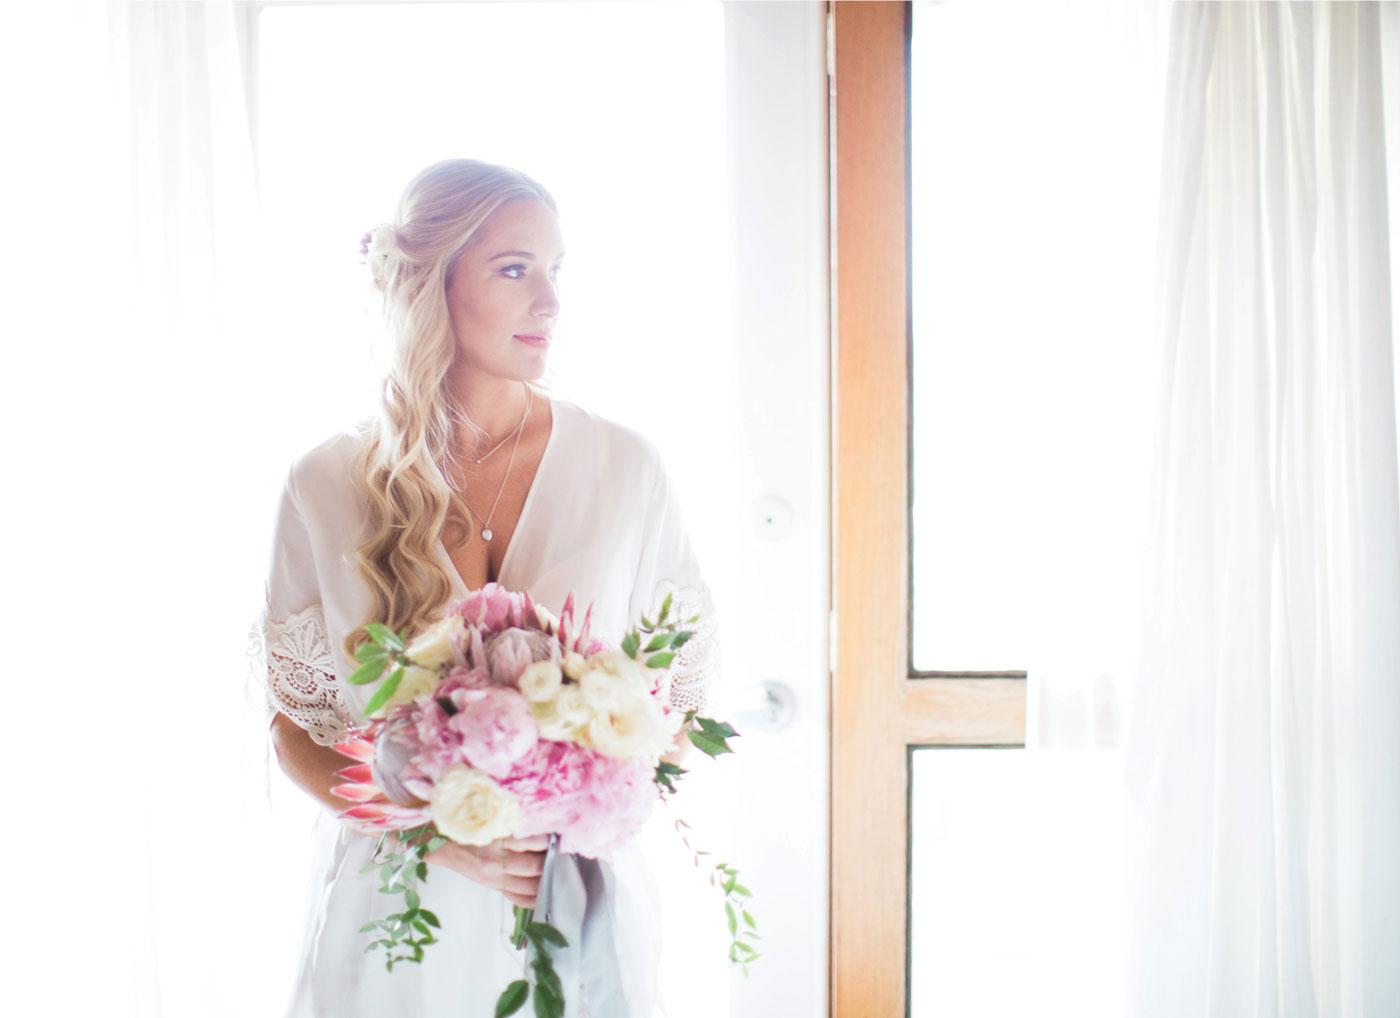 St-John-Virgin-Islands-Wedding-Photographer2.jpg